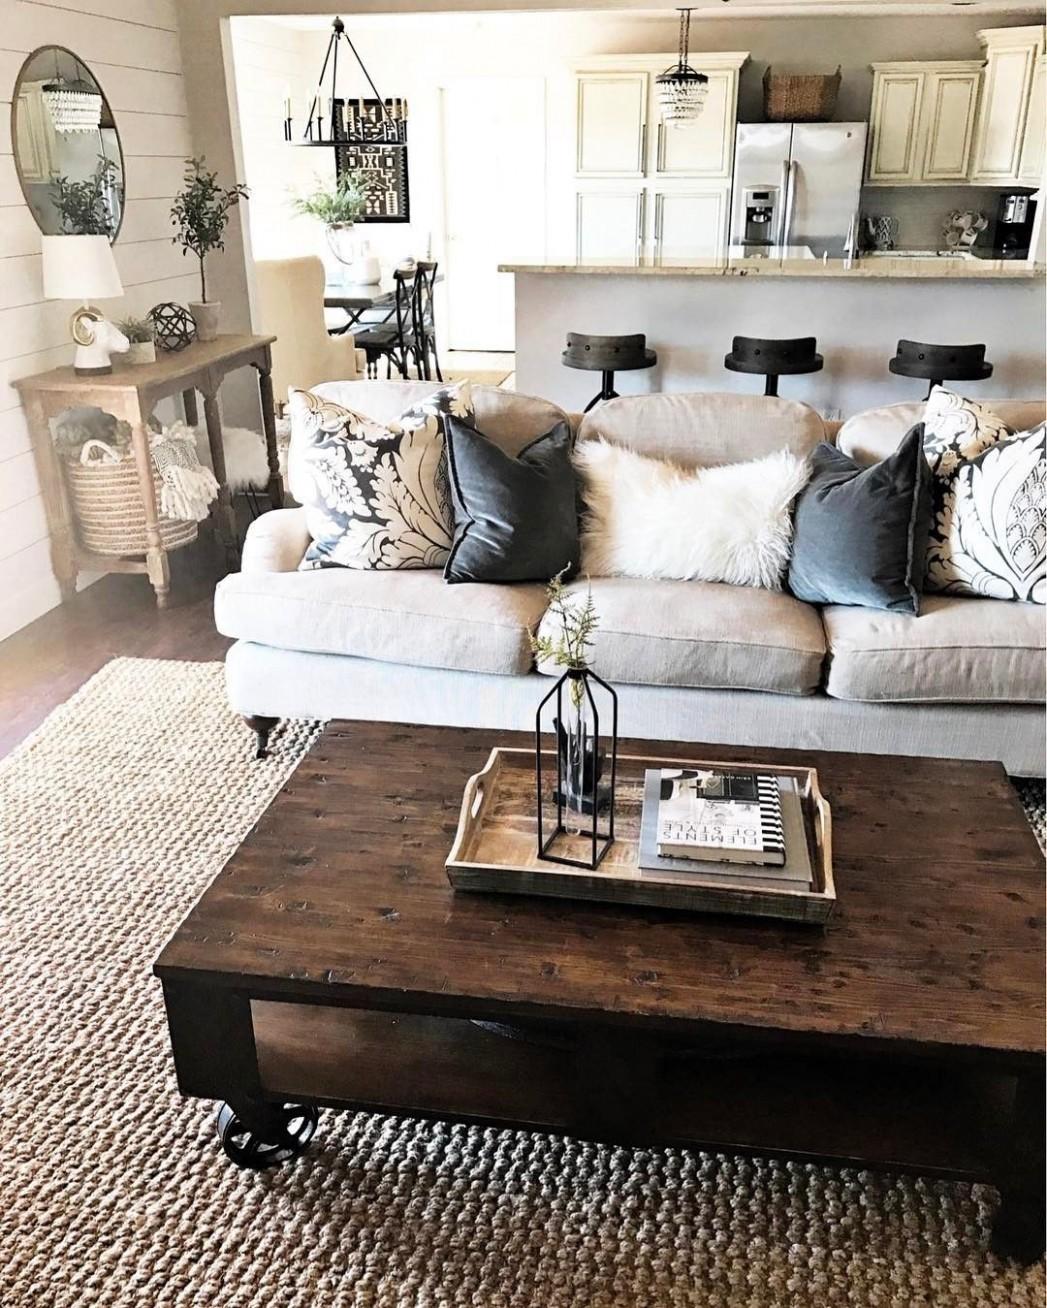 Rustic Decor Ideas for Modern Home - The Urban Interior  Modern  - Rustic Apartment Decor Ideas